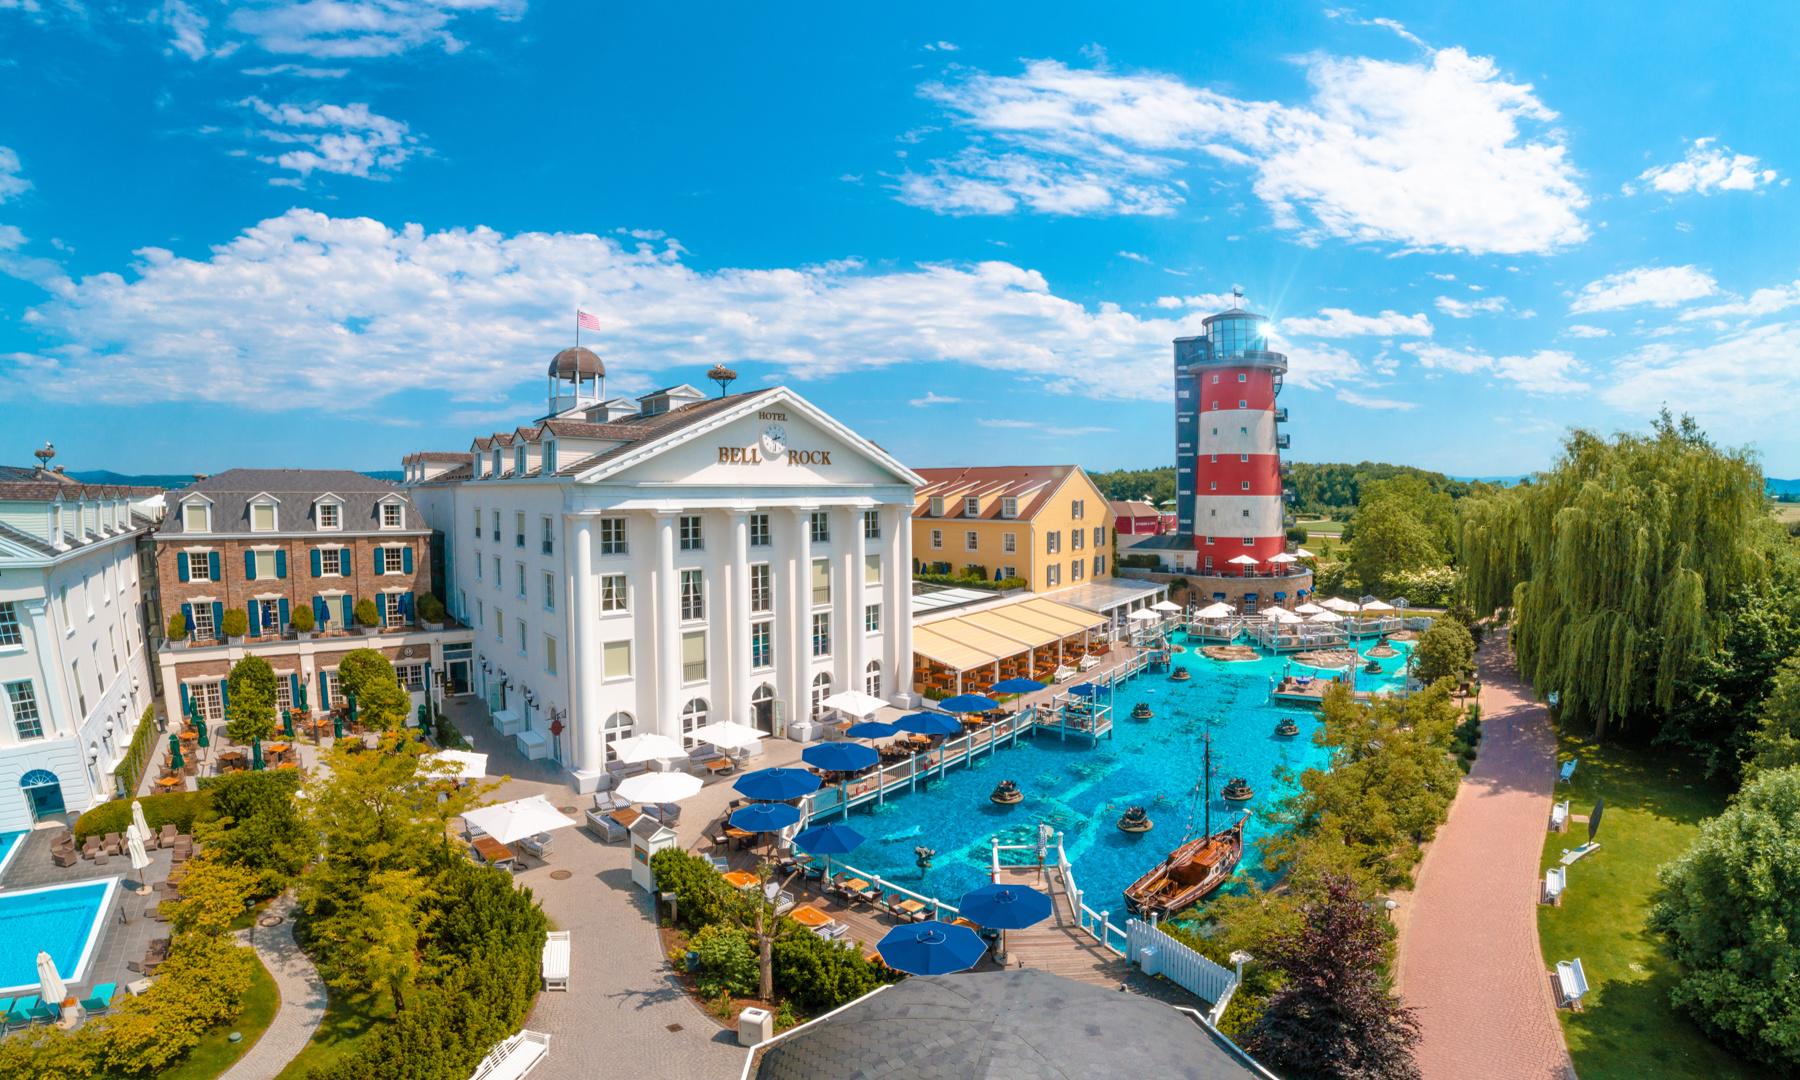 Hotel Buchen Zimmer Reservieren Europa Park Rust